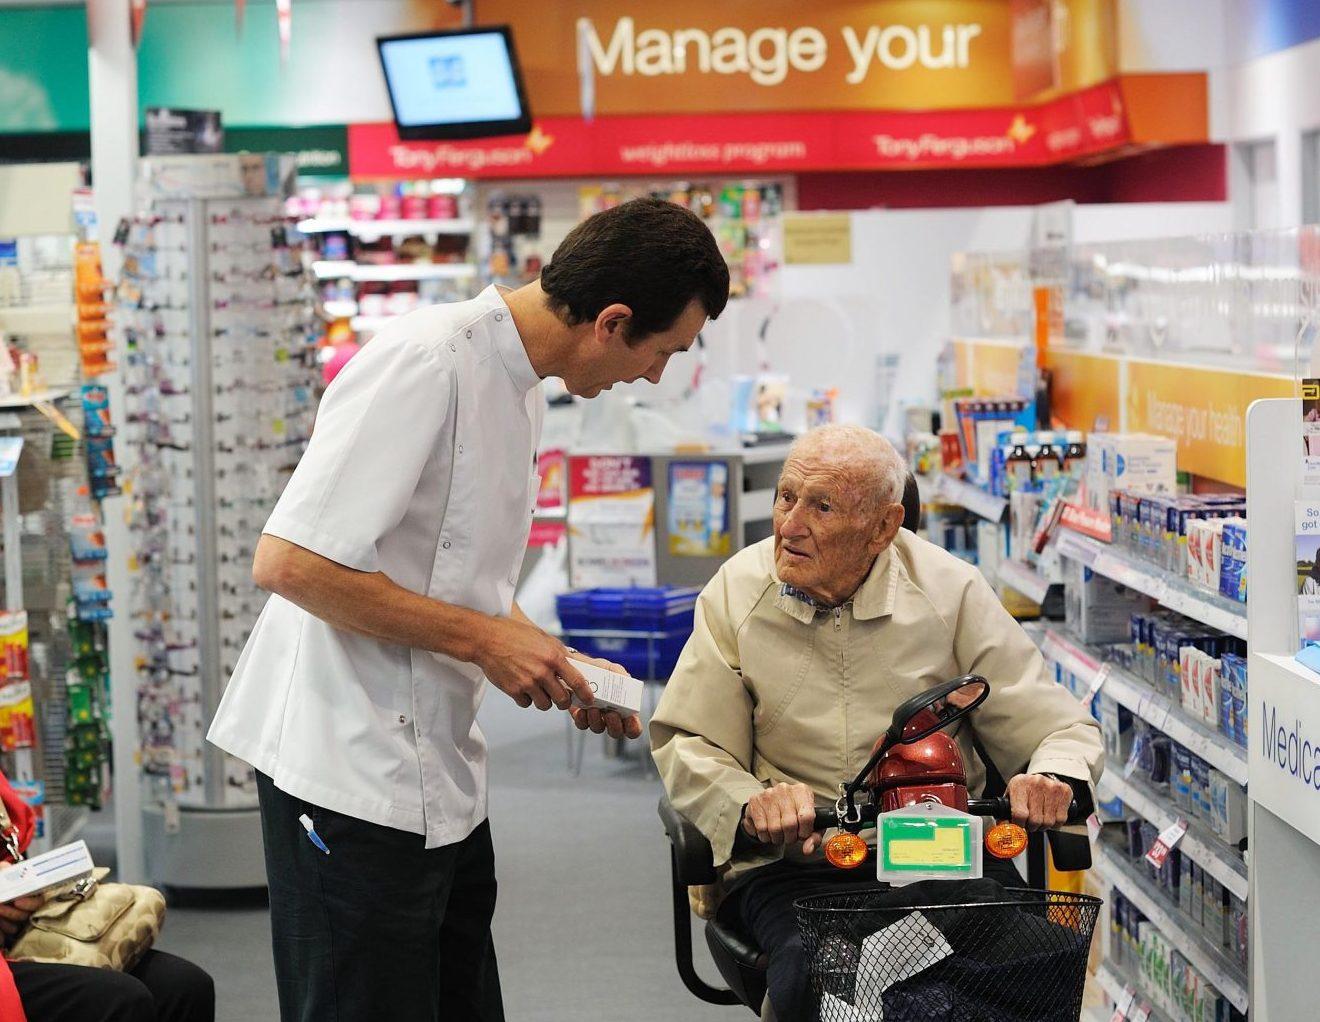 pharmacist speaking to elderly man in Terry White Chemist